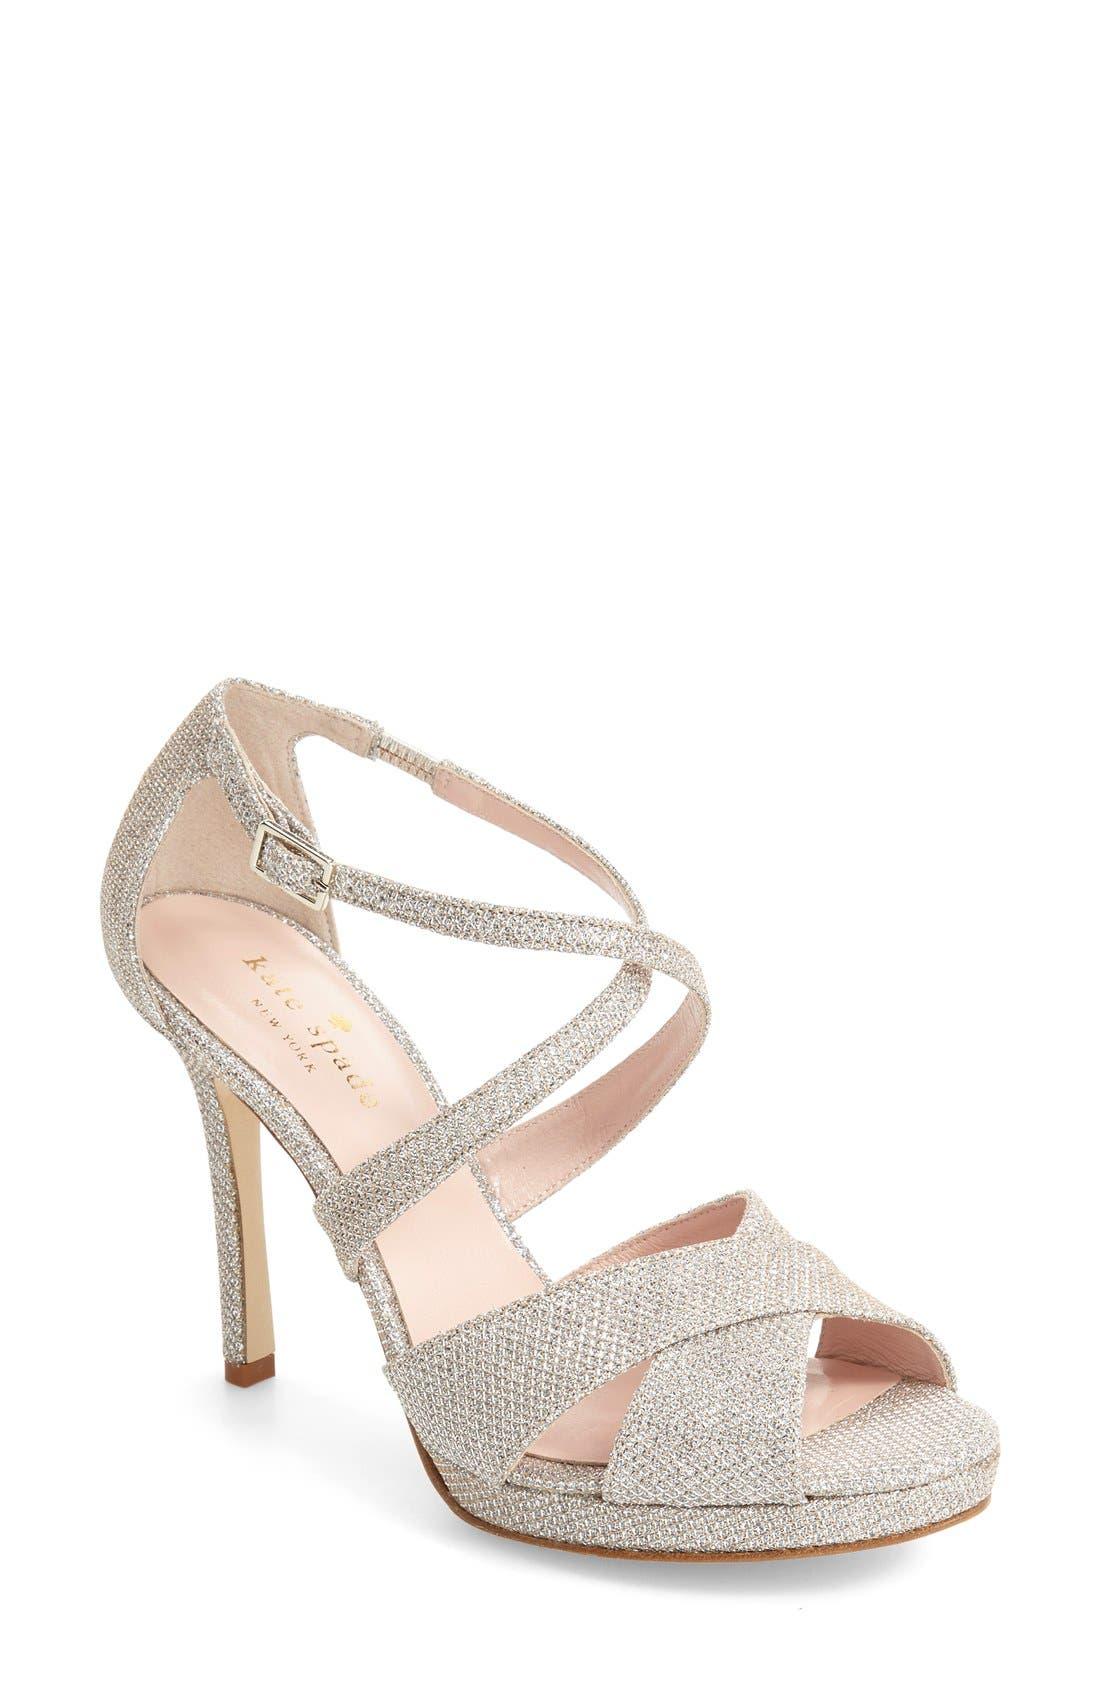 Alternate Image 1 Selected - kate spade new york frances platform sandal (Women)